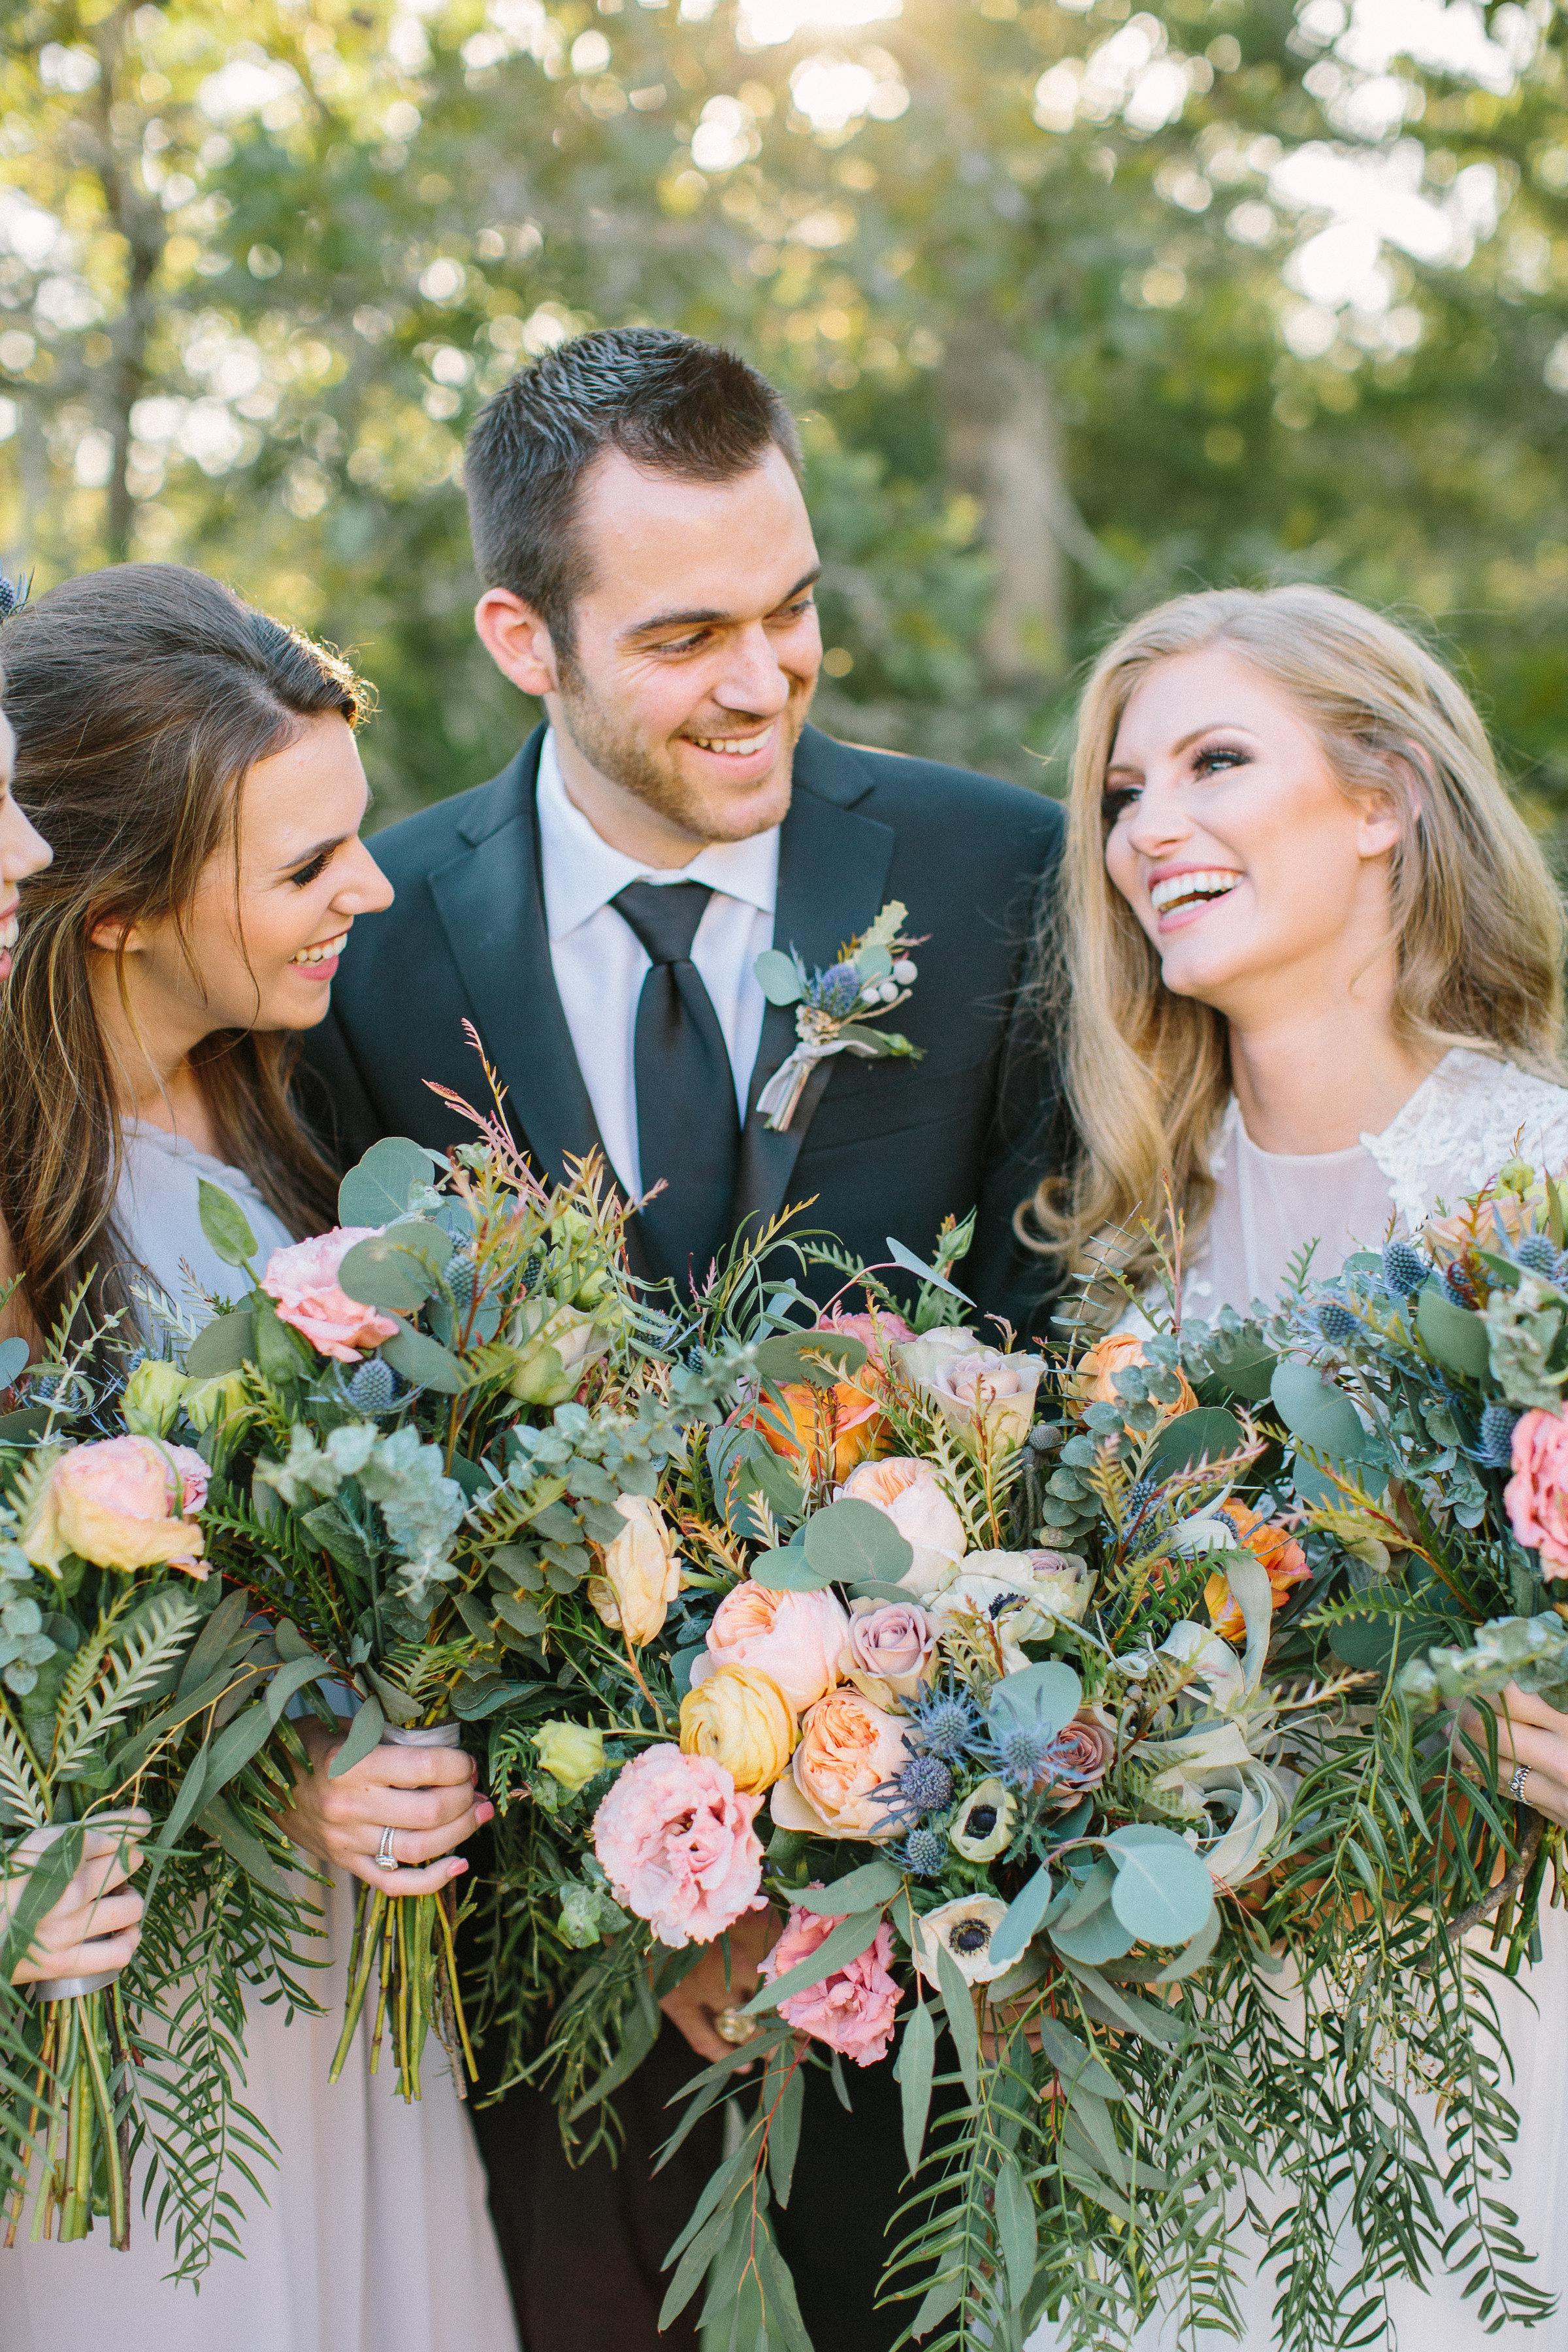 Ellen-Ashton-Photography-Peach-Creek-Ranch-Weddings-Wed-and-Prosper251